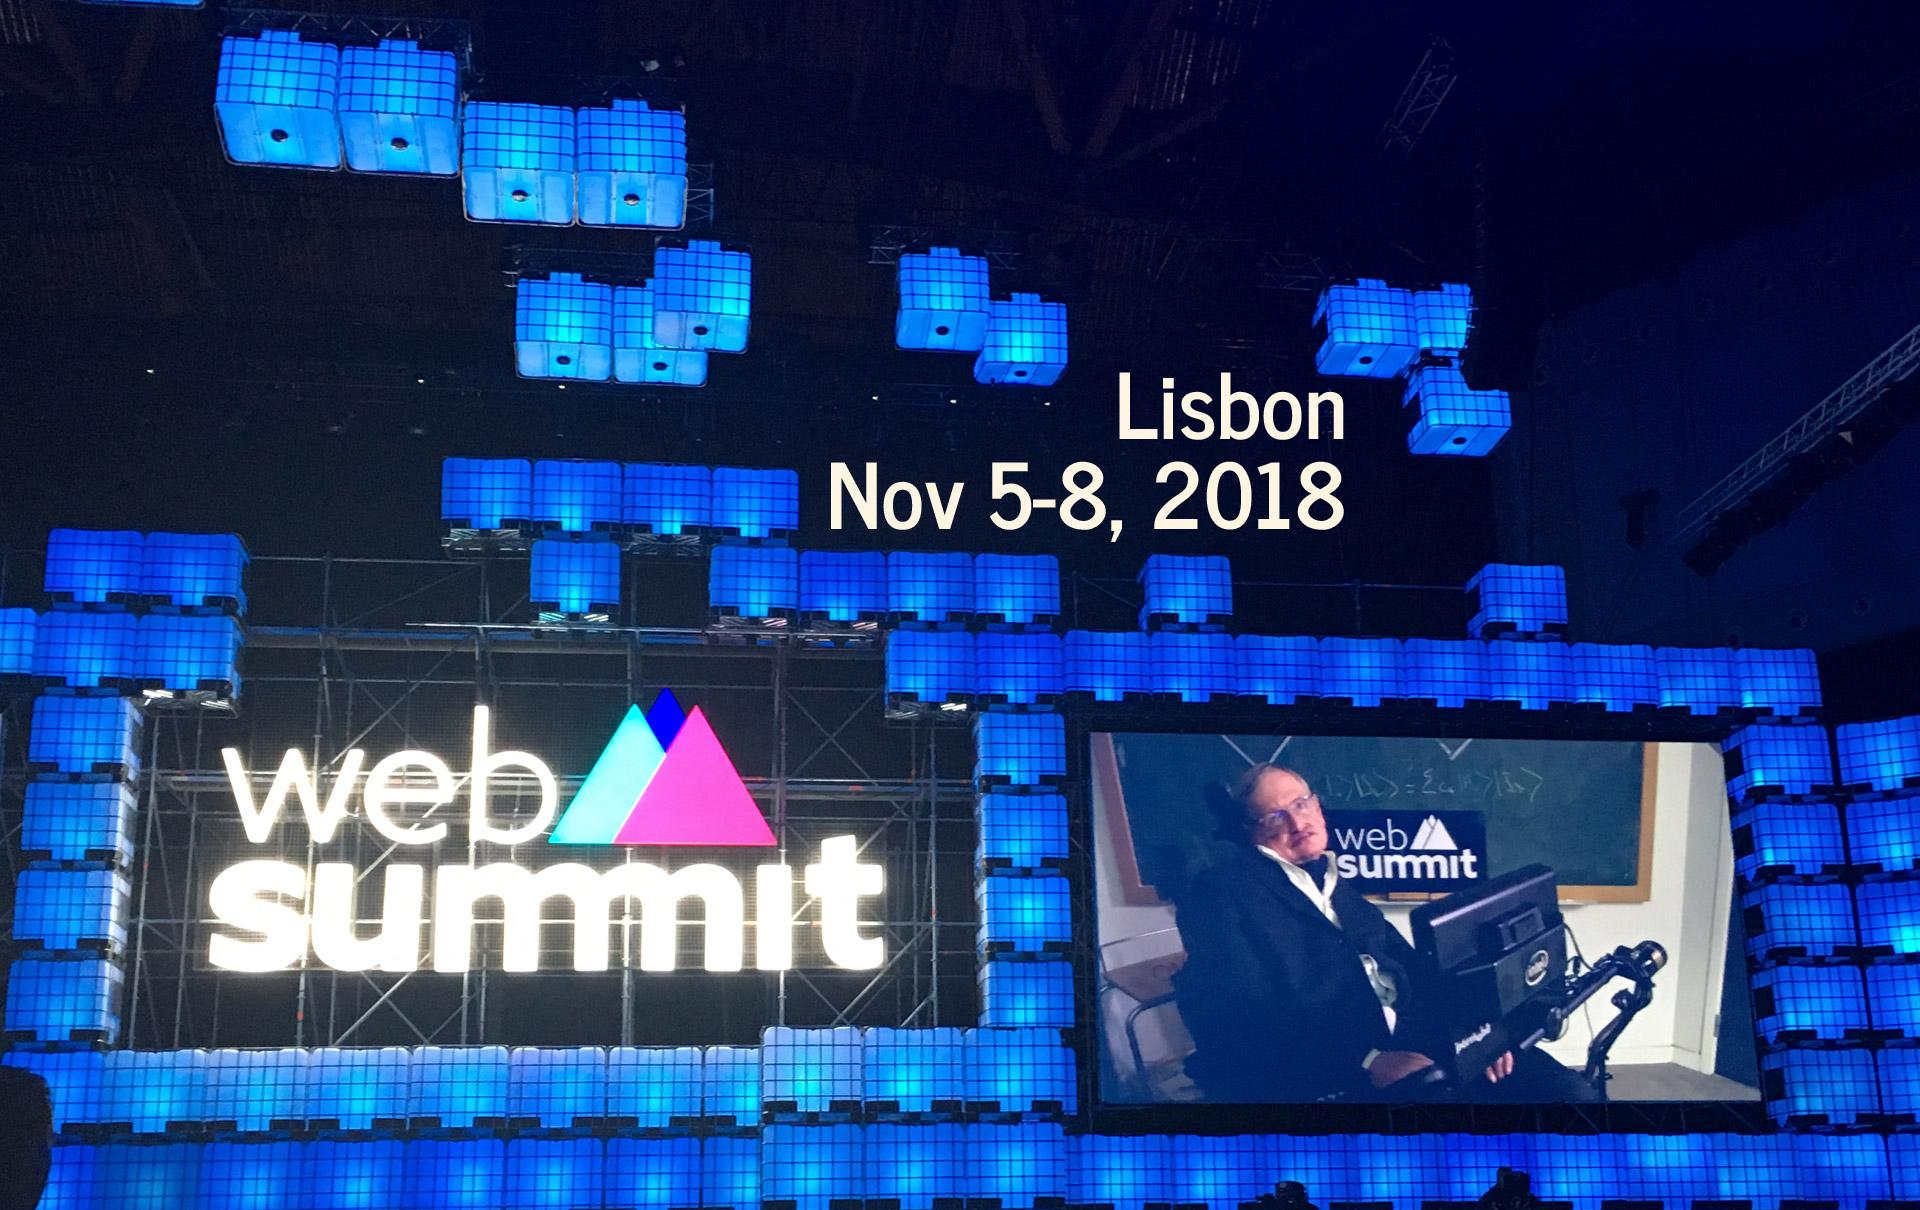 Web Summit 2018 Lisbon Nov 5-8